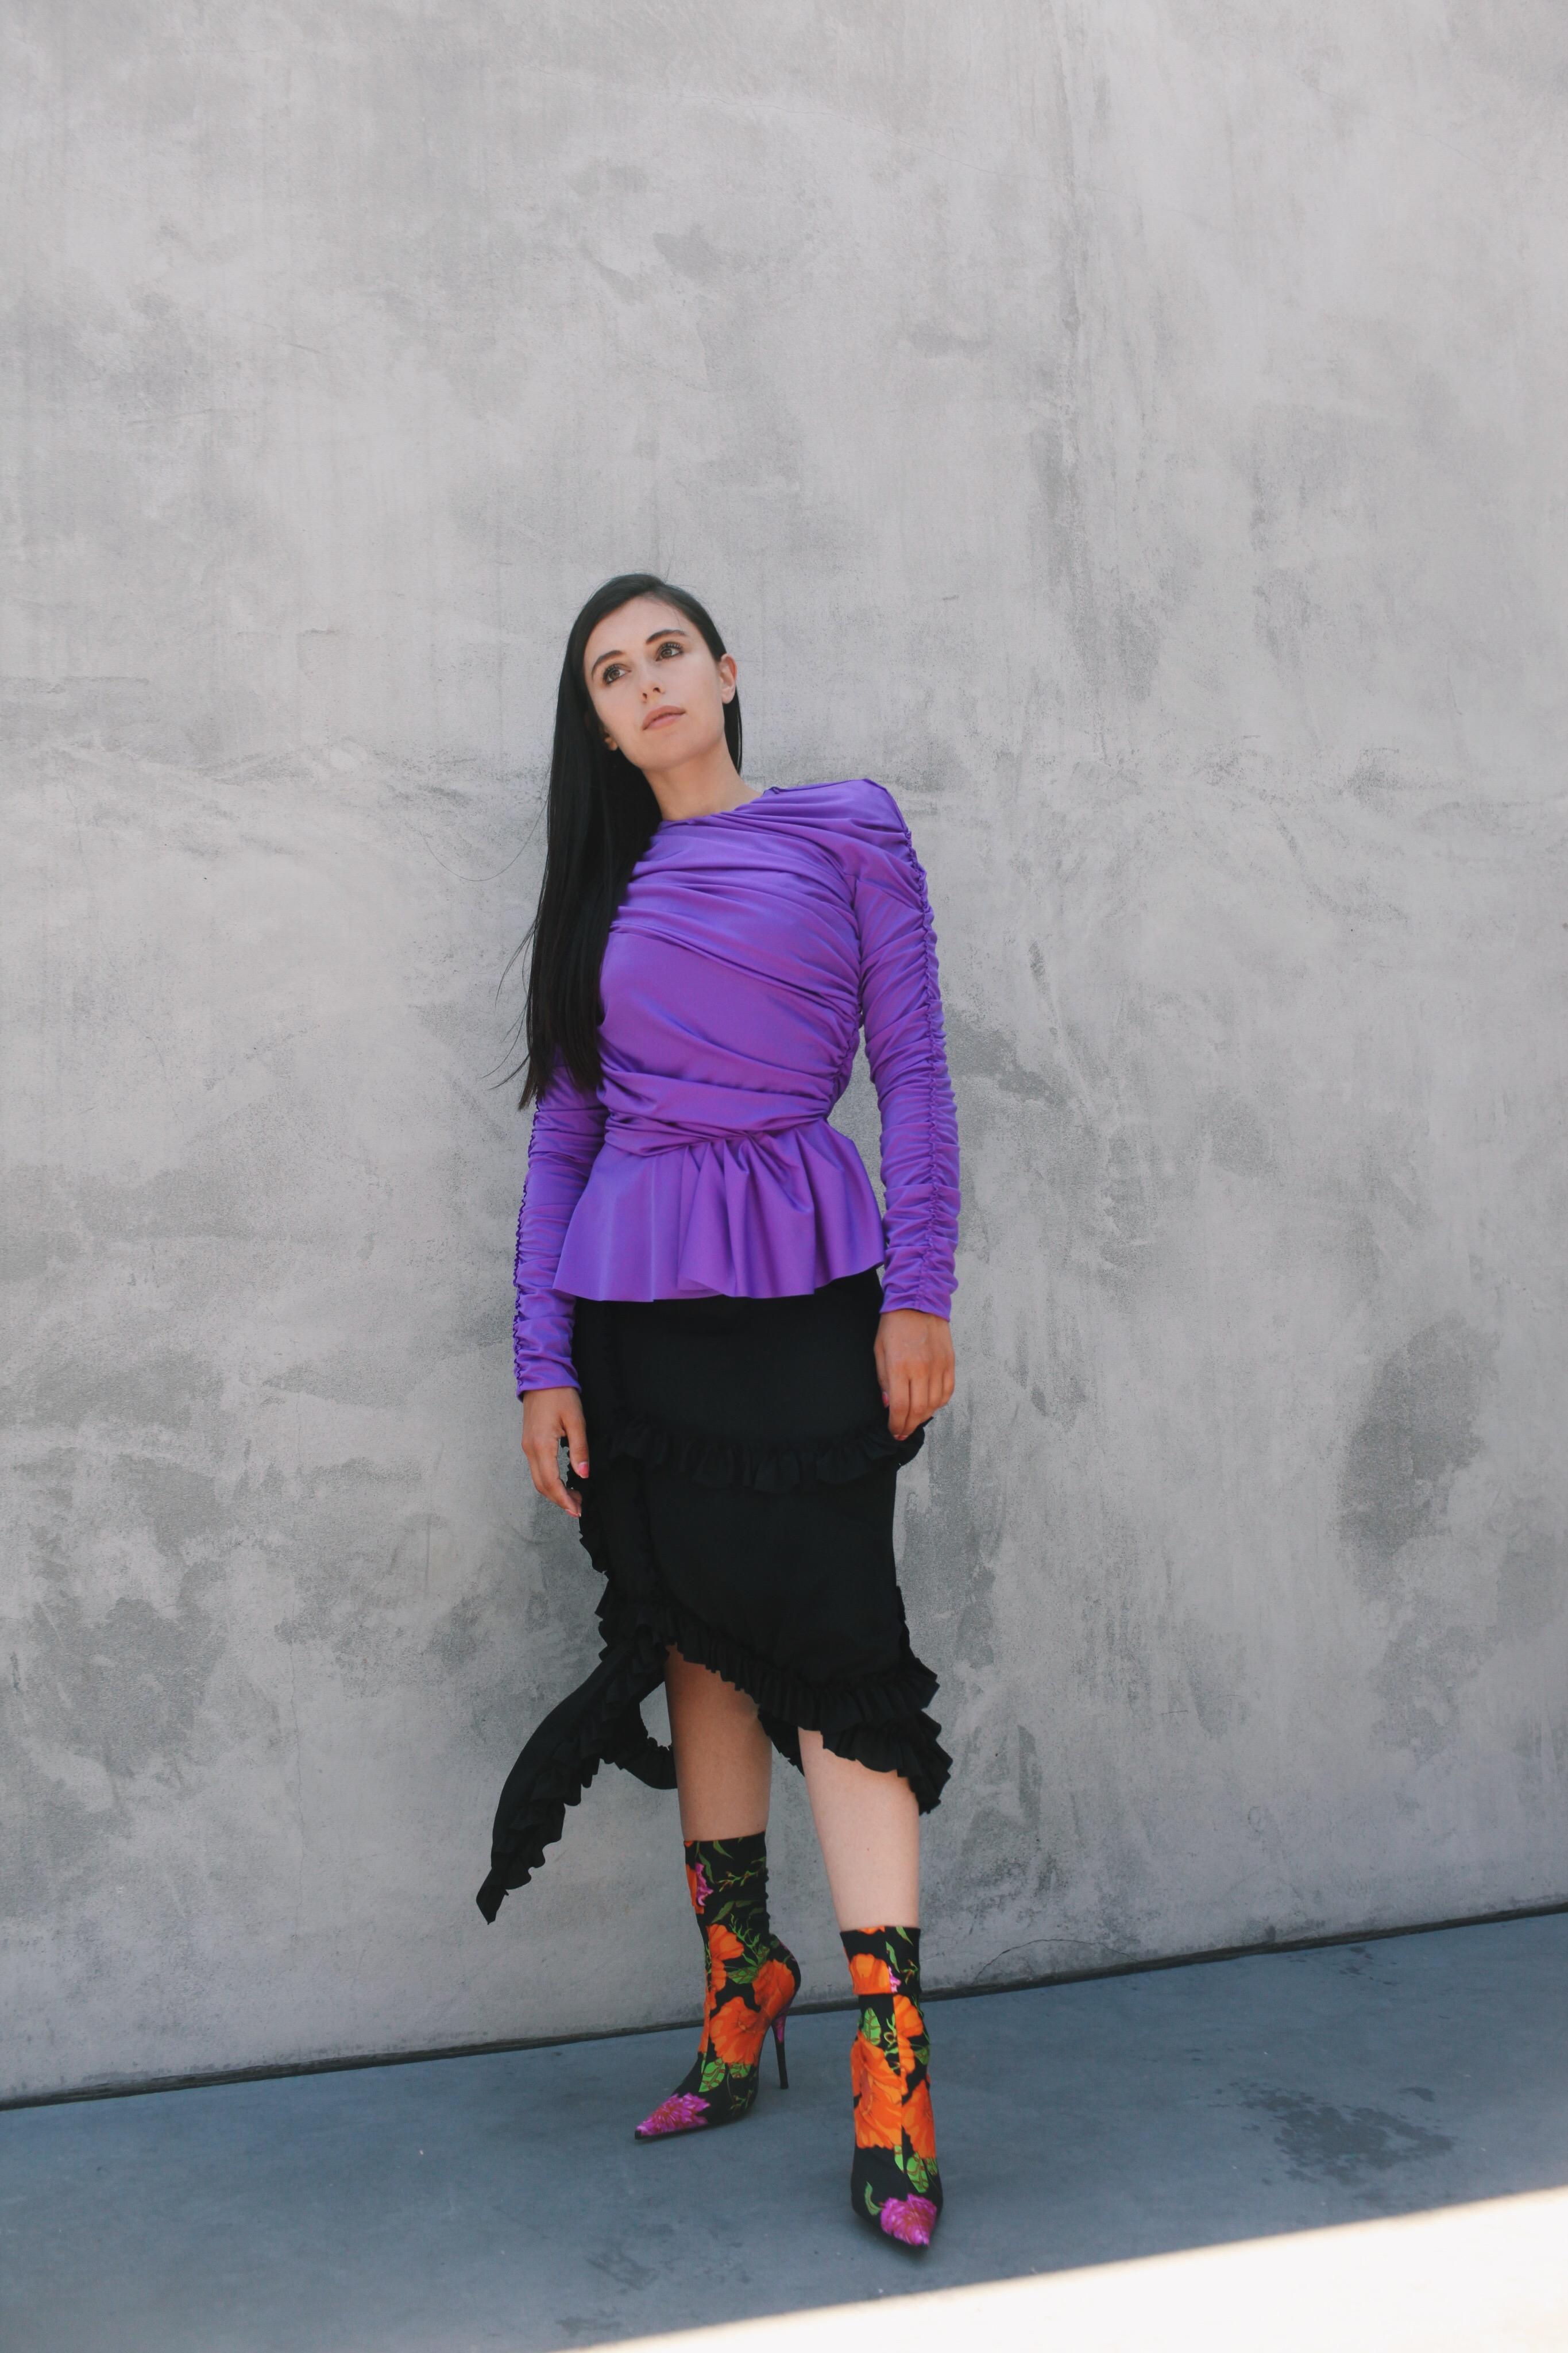 Model and actress Marta Pozzan in Balenciaga at Maxfield, 2017.